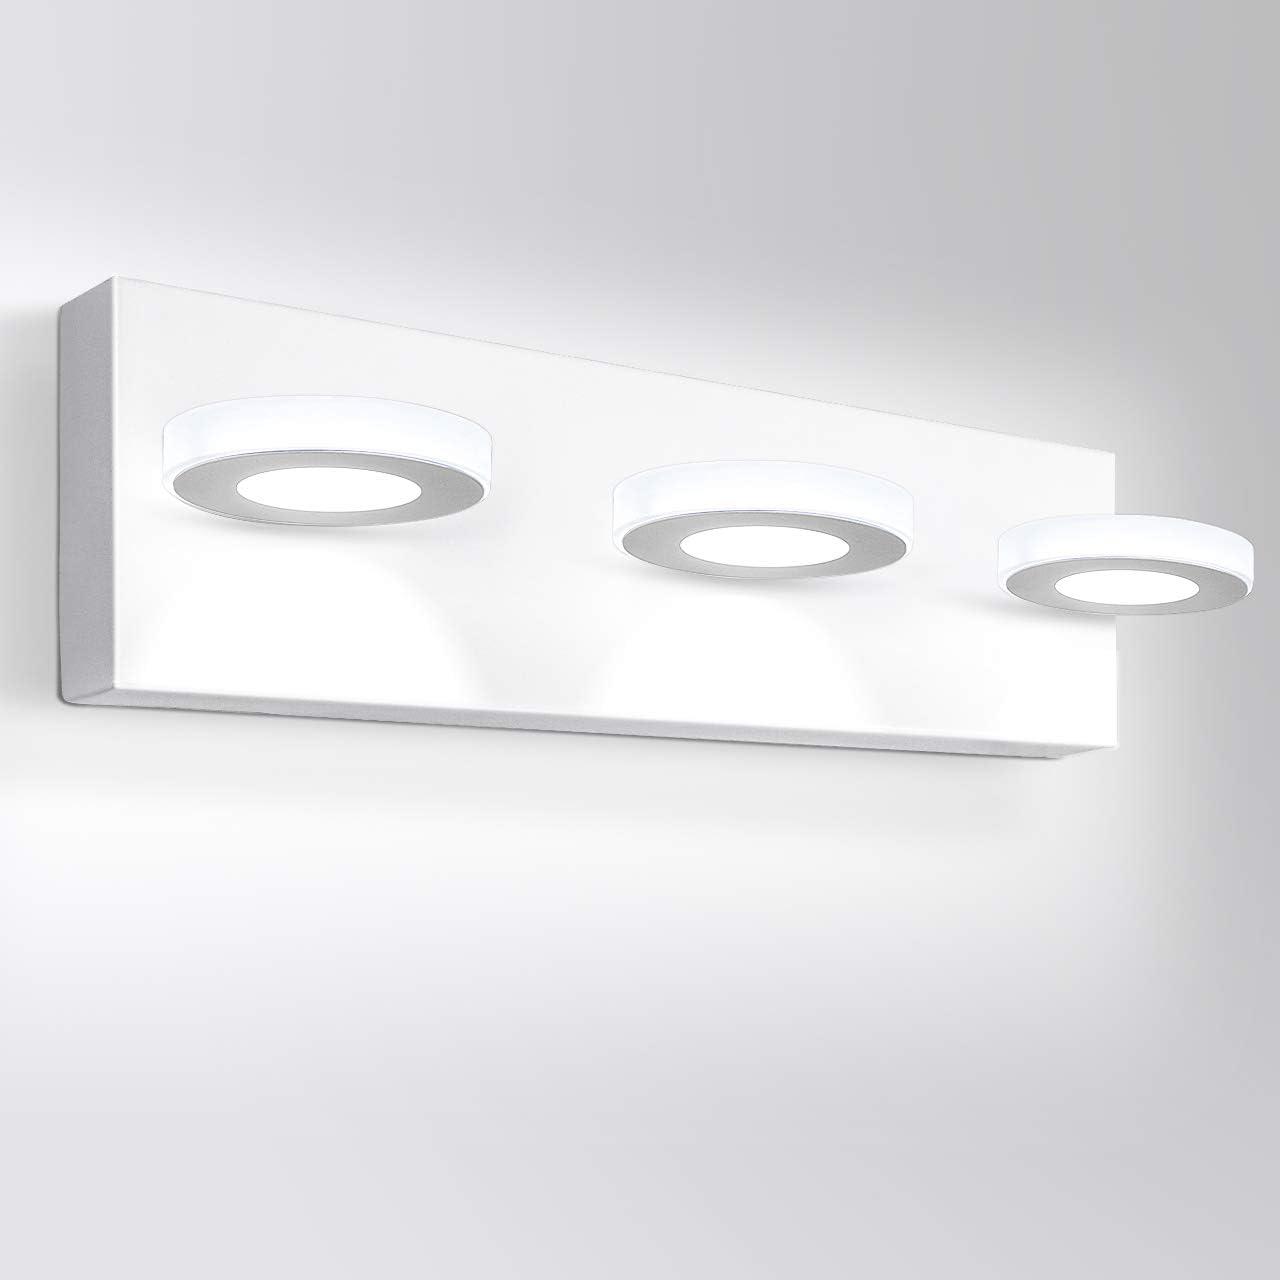 Amazon Com Oowolf Led Bathroom Vanity Lights 17 Inch Modern Wall Light Fixtures 3 Lights Acrylic Wall Lighting Indoor For Bathroom Lamp 6000k 1200lm Cool White Light Home Improvement